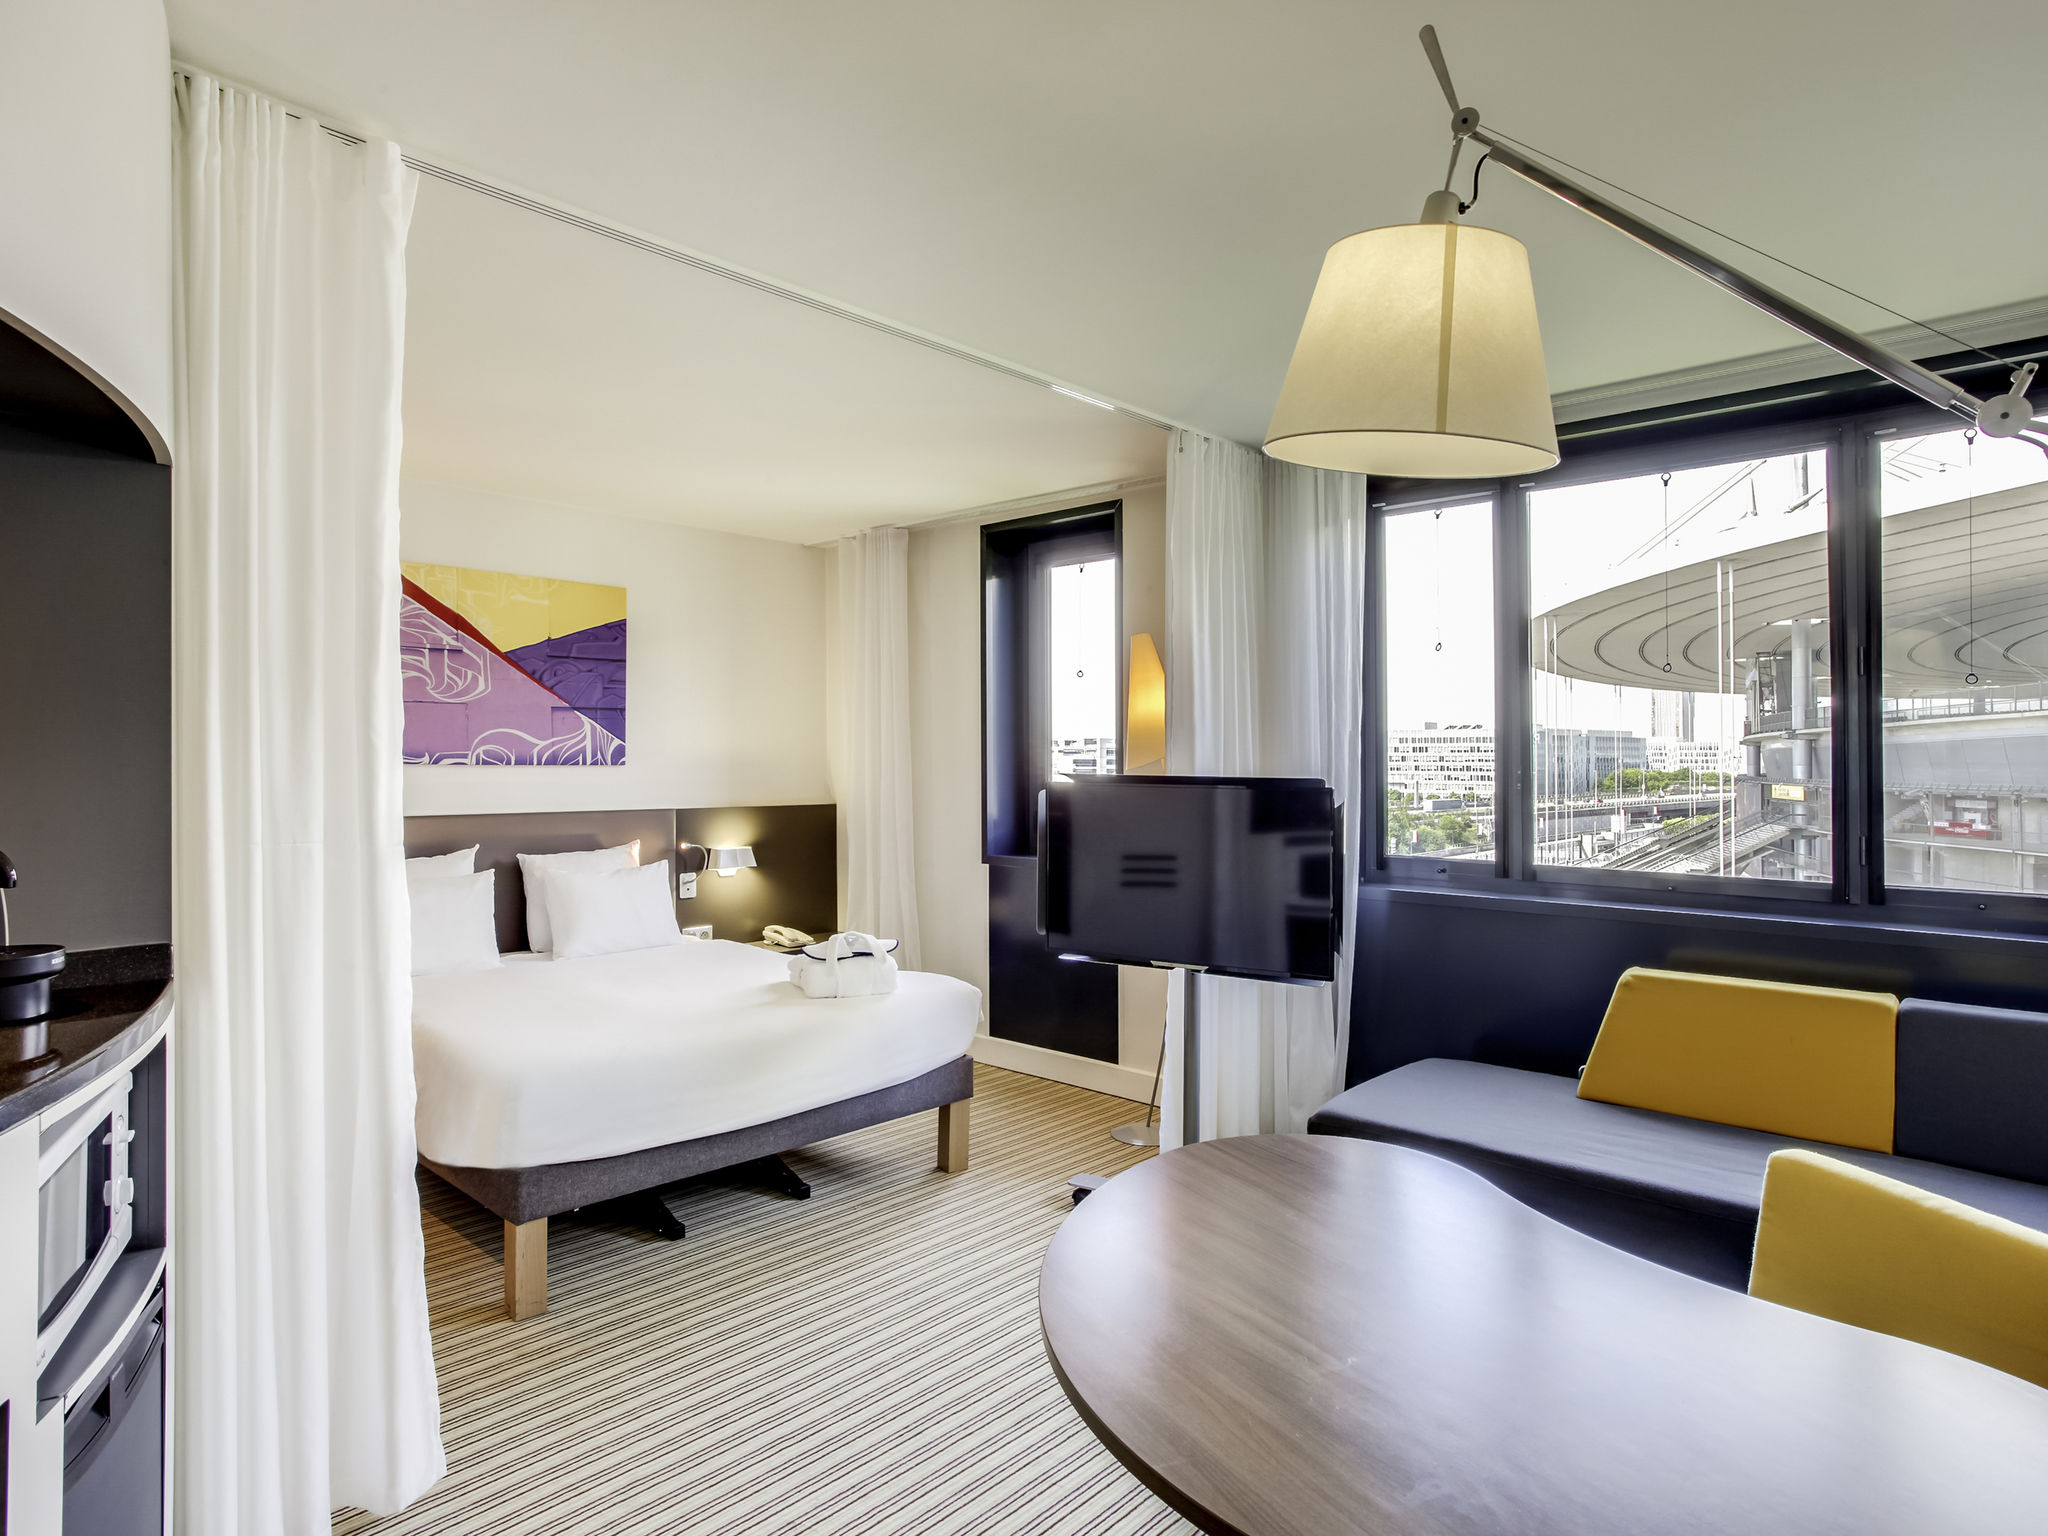 Hotel - Novotel Suites Paris Stade de France hotel